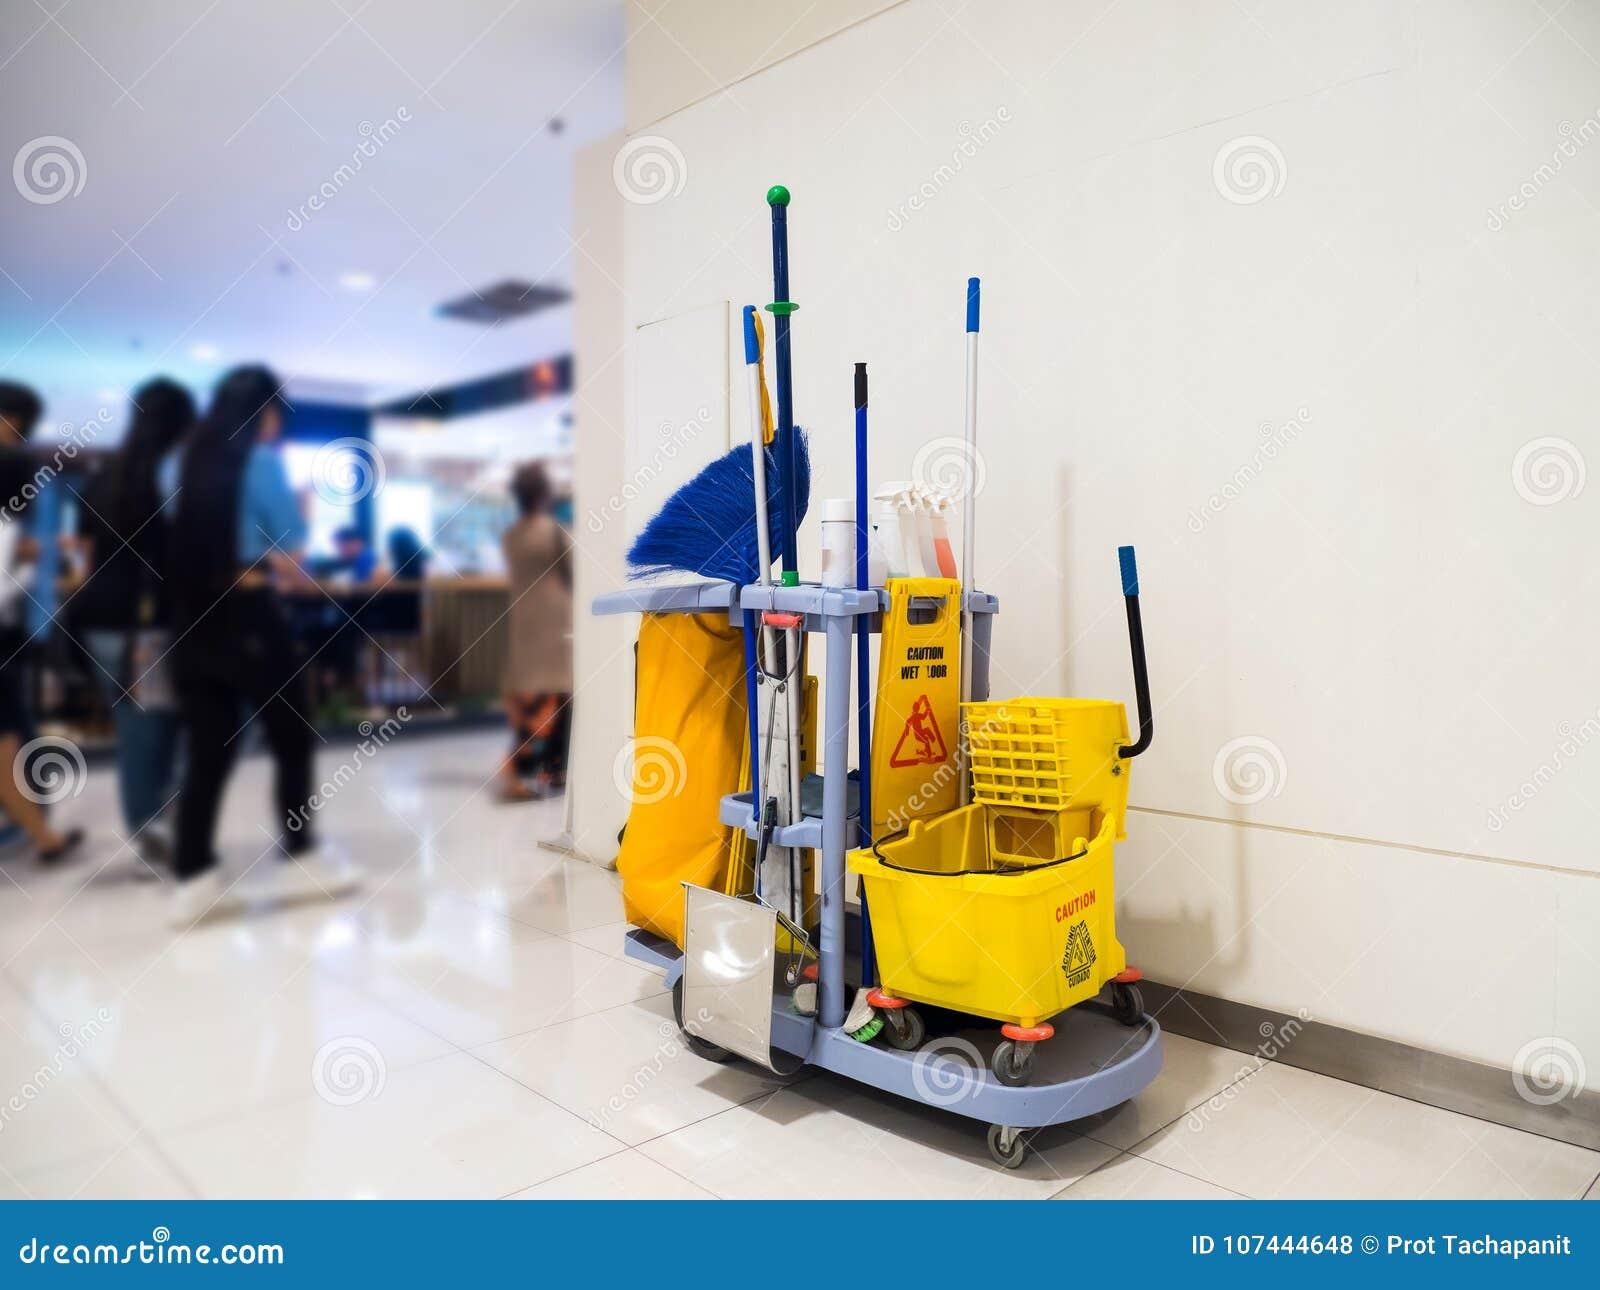 Espera do carro das ferramentas da limpeza para limpar Cubeta e grupo de equipamento da limpeza no armazém